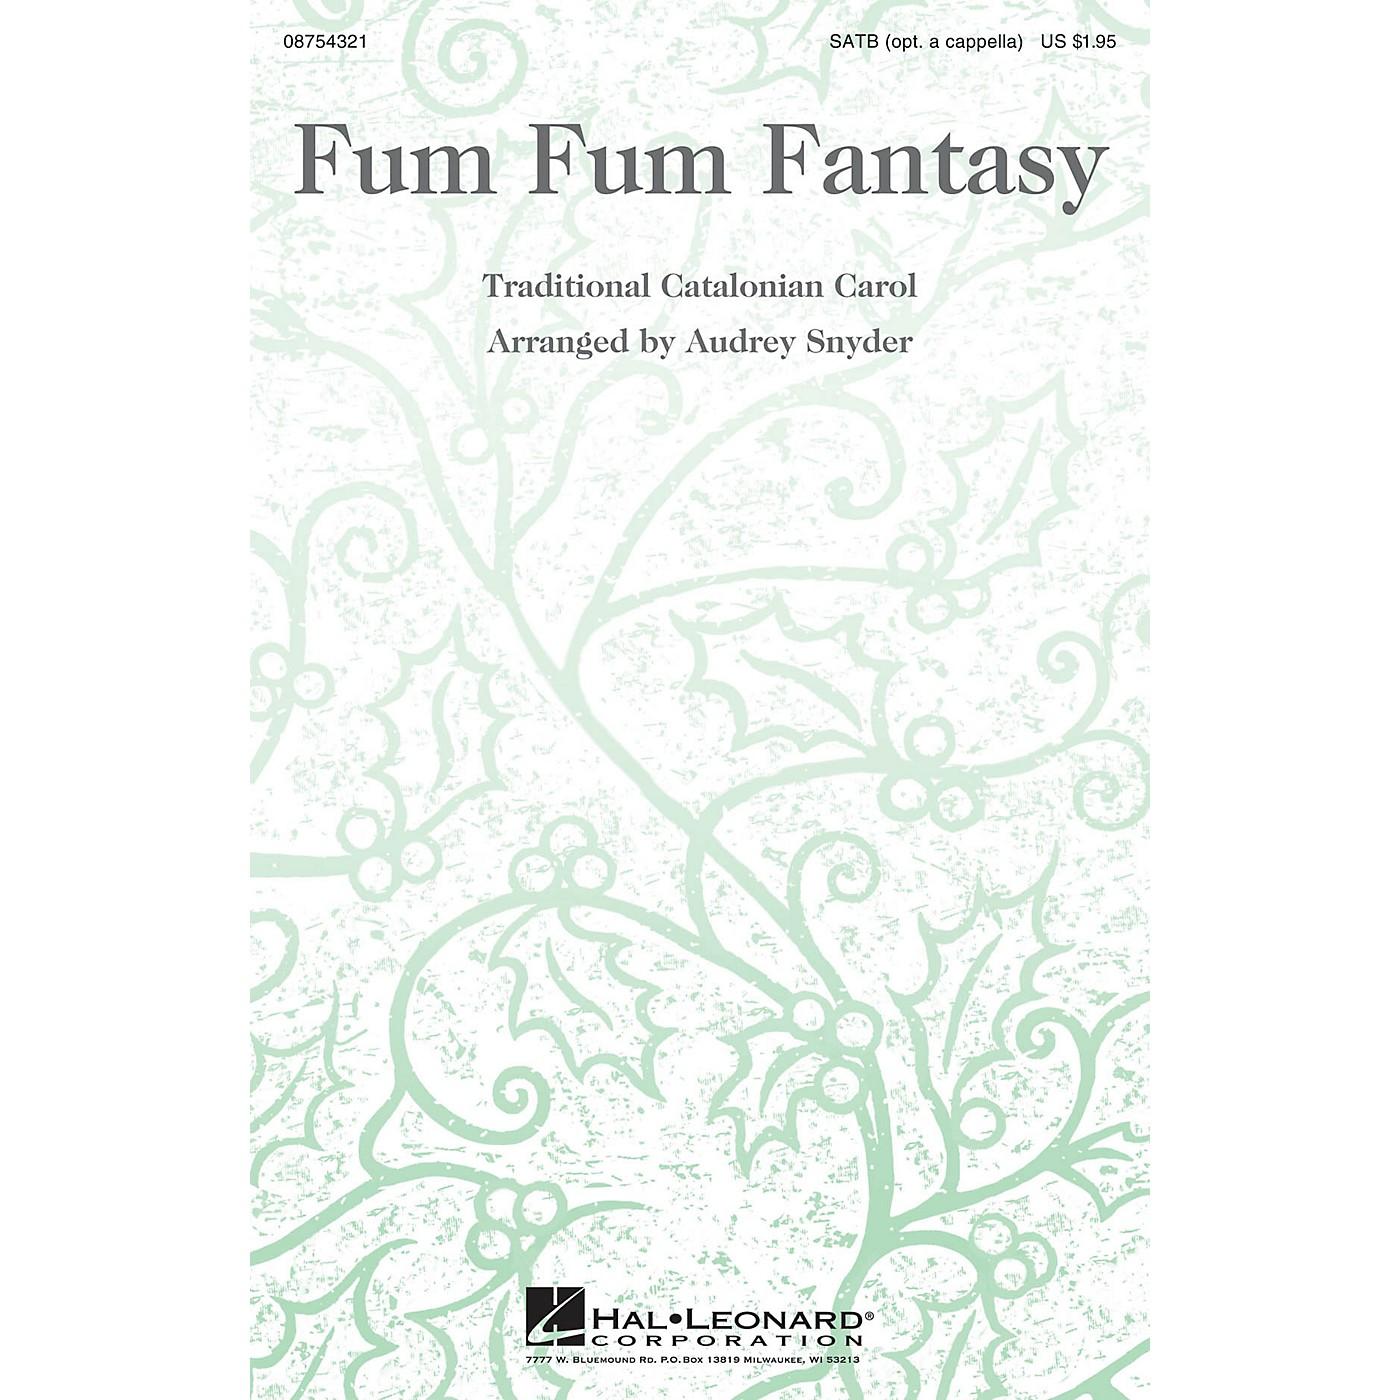 Hal Leonard Fum Fum Fantasy SATB arranged by Audrey Snyder thumbnail